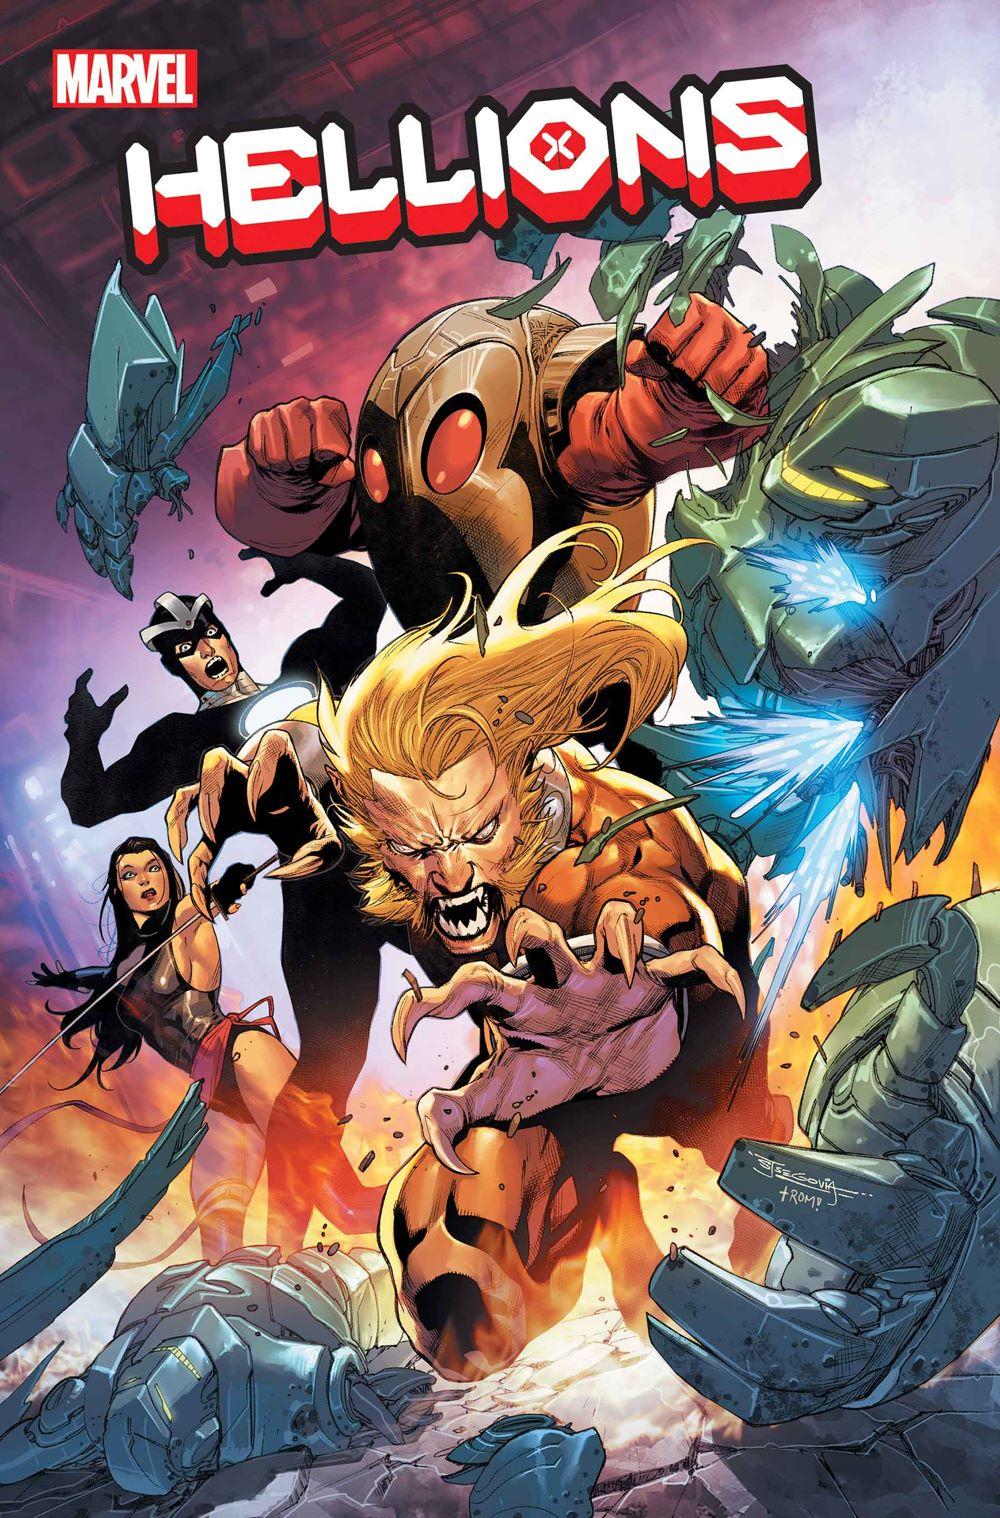 HELLIONS2020008_COV_COL Marvel Comics January 2021 Solicitations